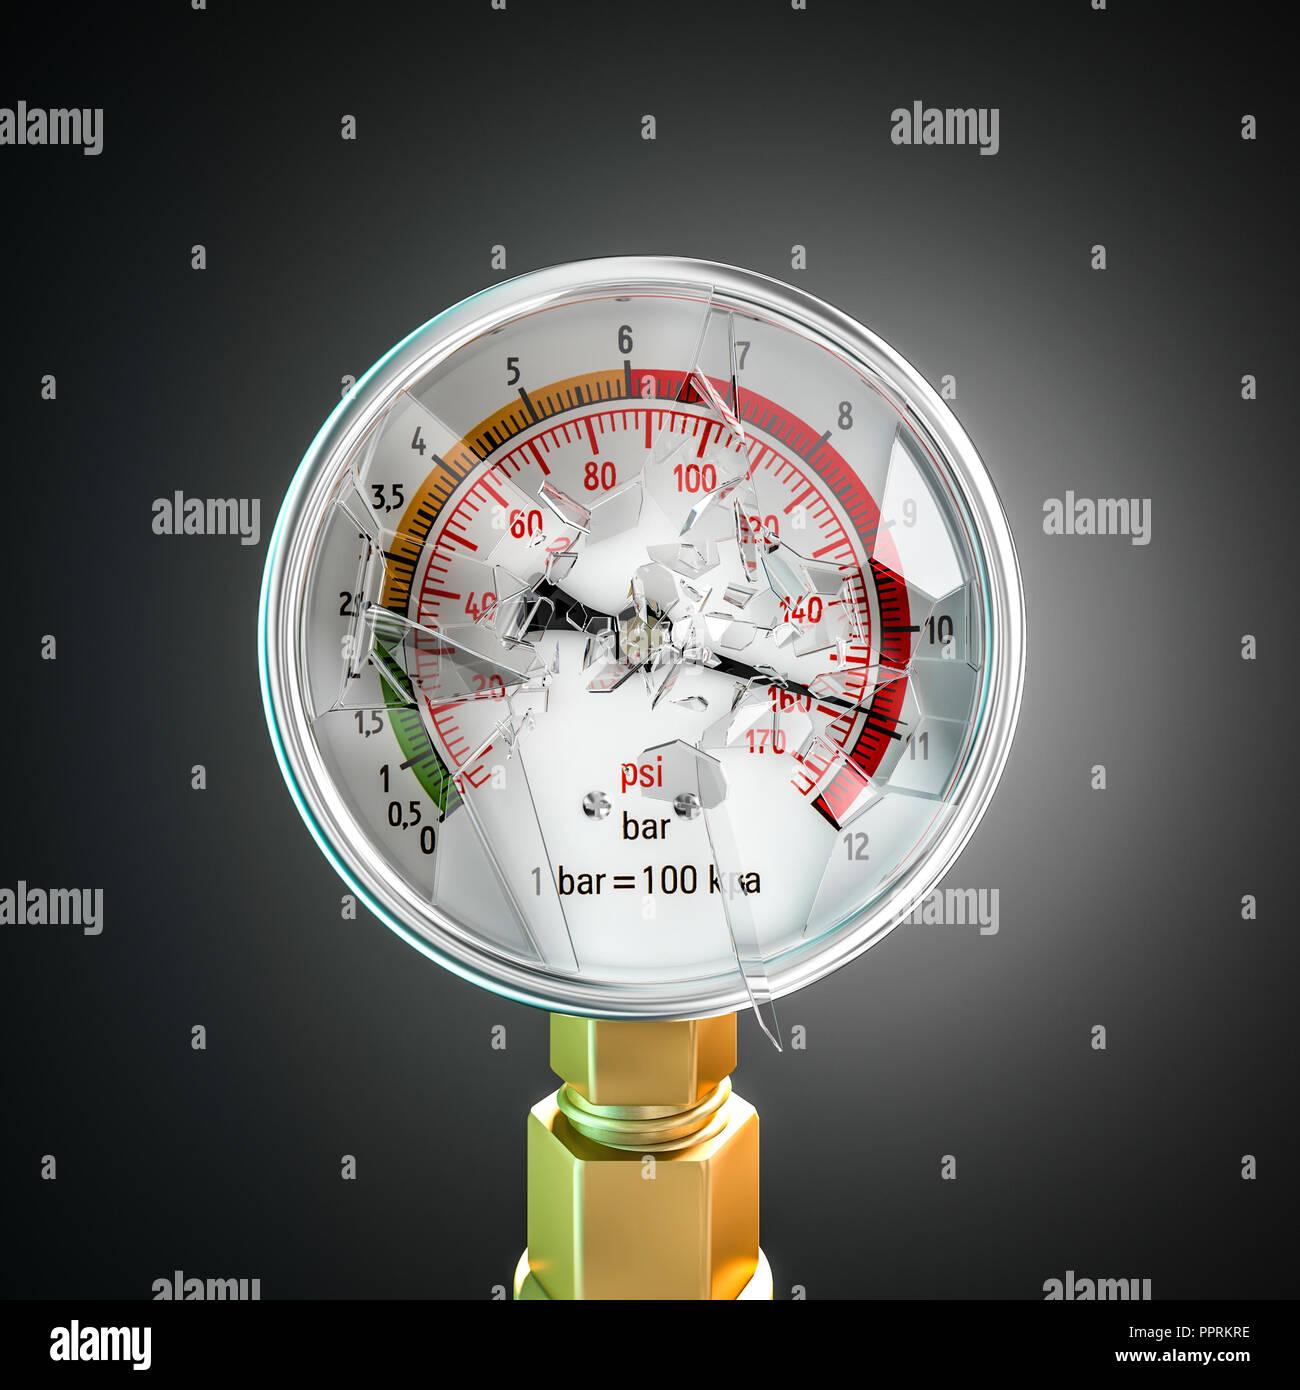 explosion of pressure gauge glass 3d rendering image - Stock Image